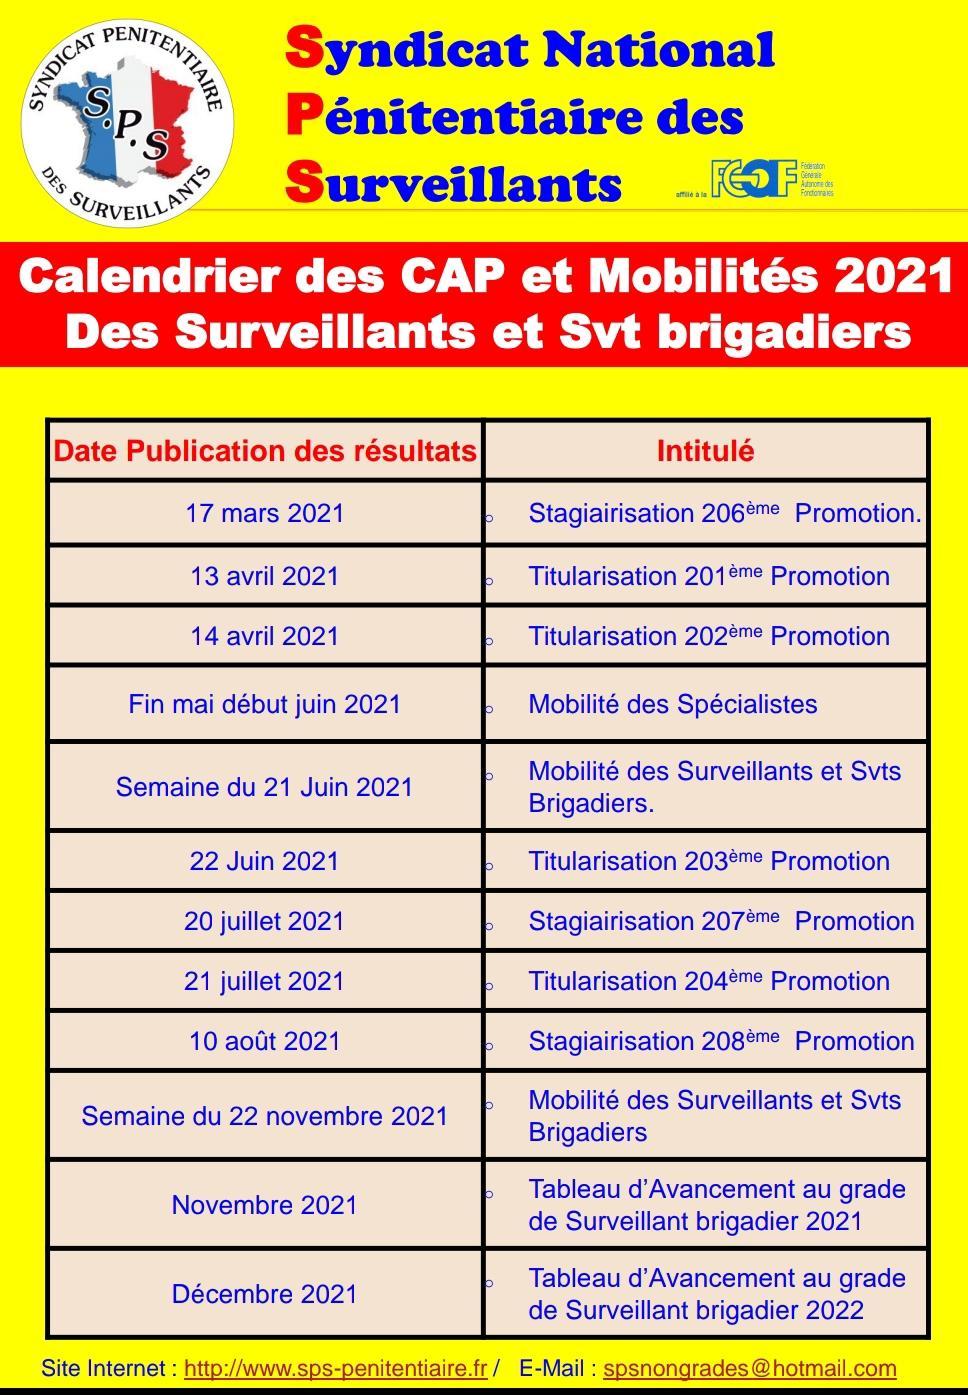 Calendrier dap 2021